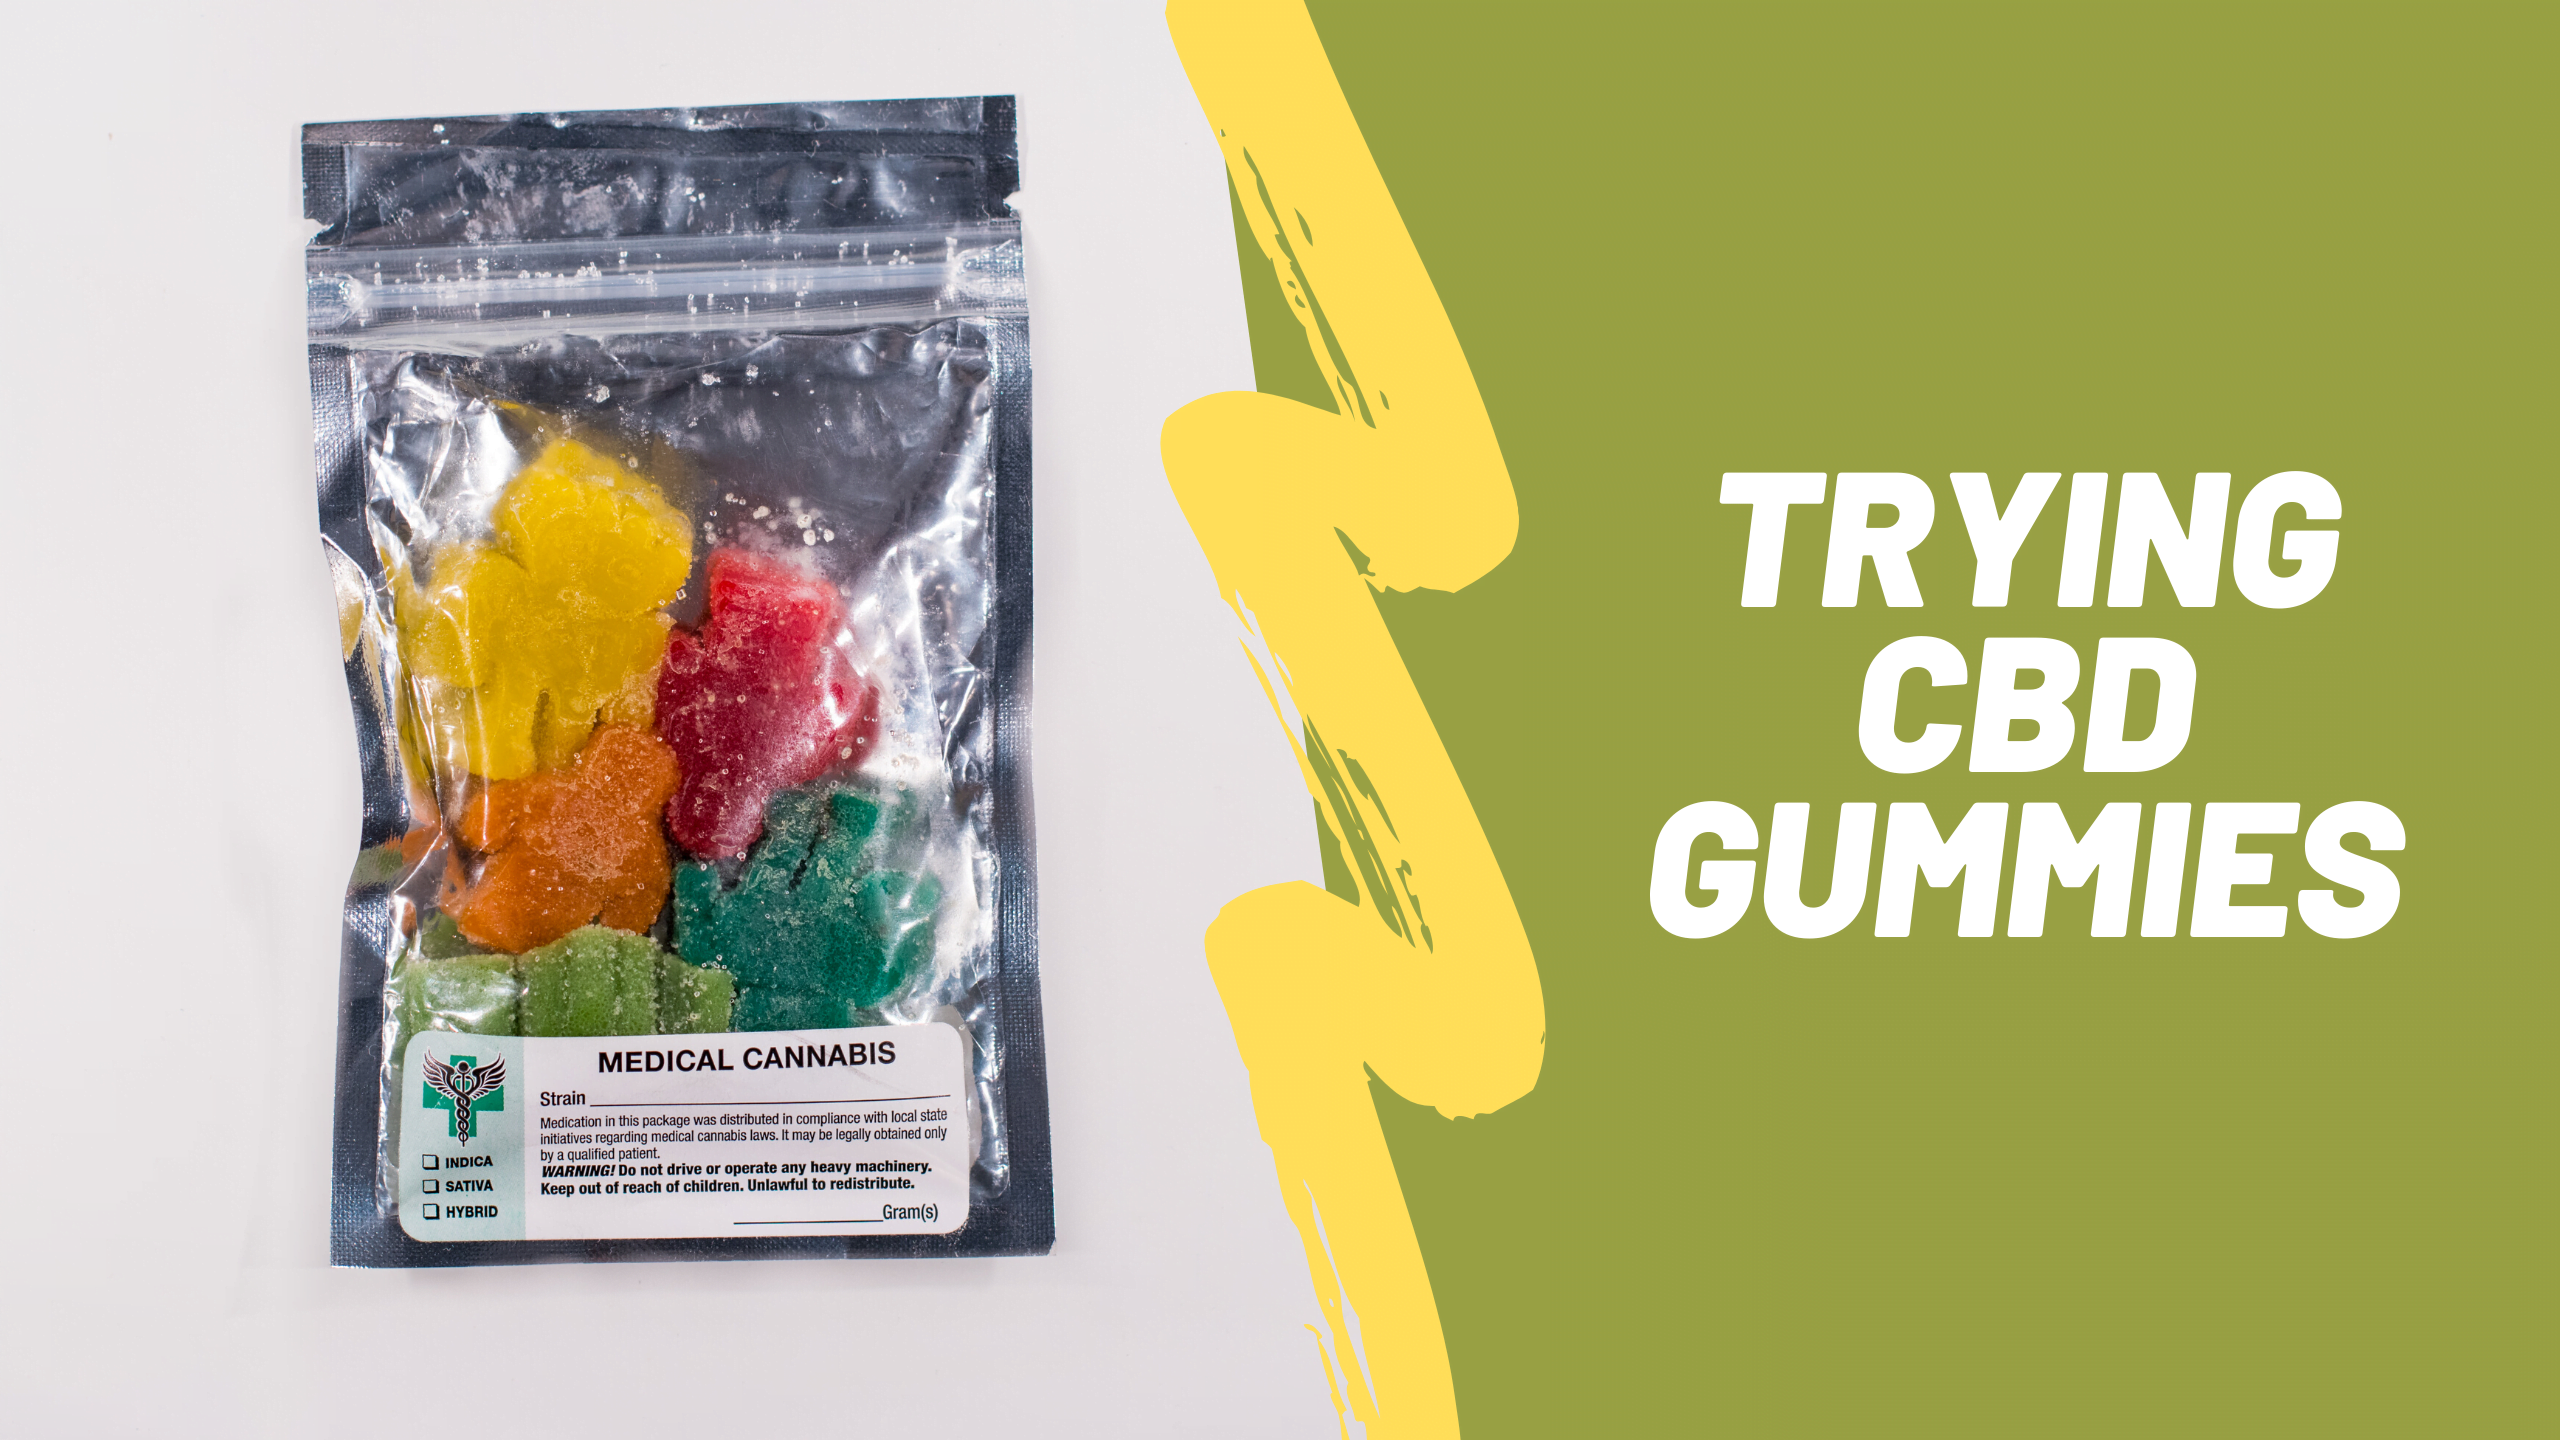 Trying CBD gummies- I Had  Good Impressions